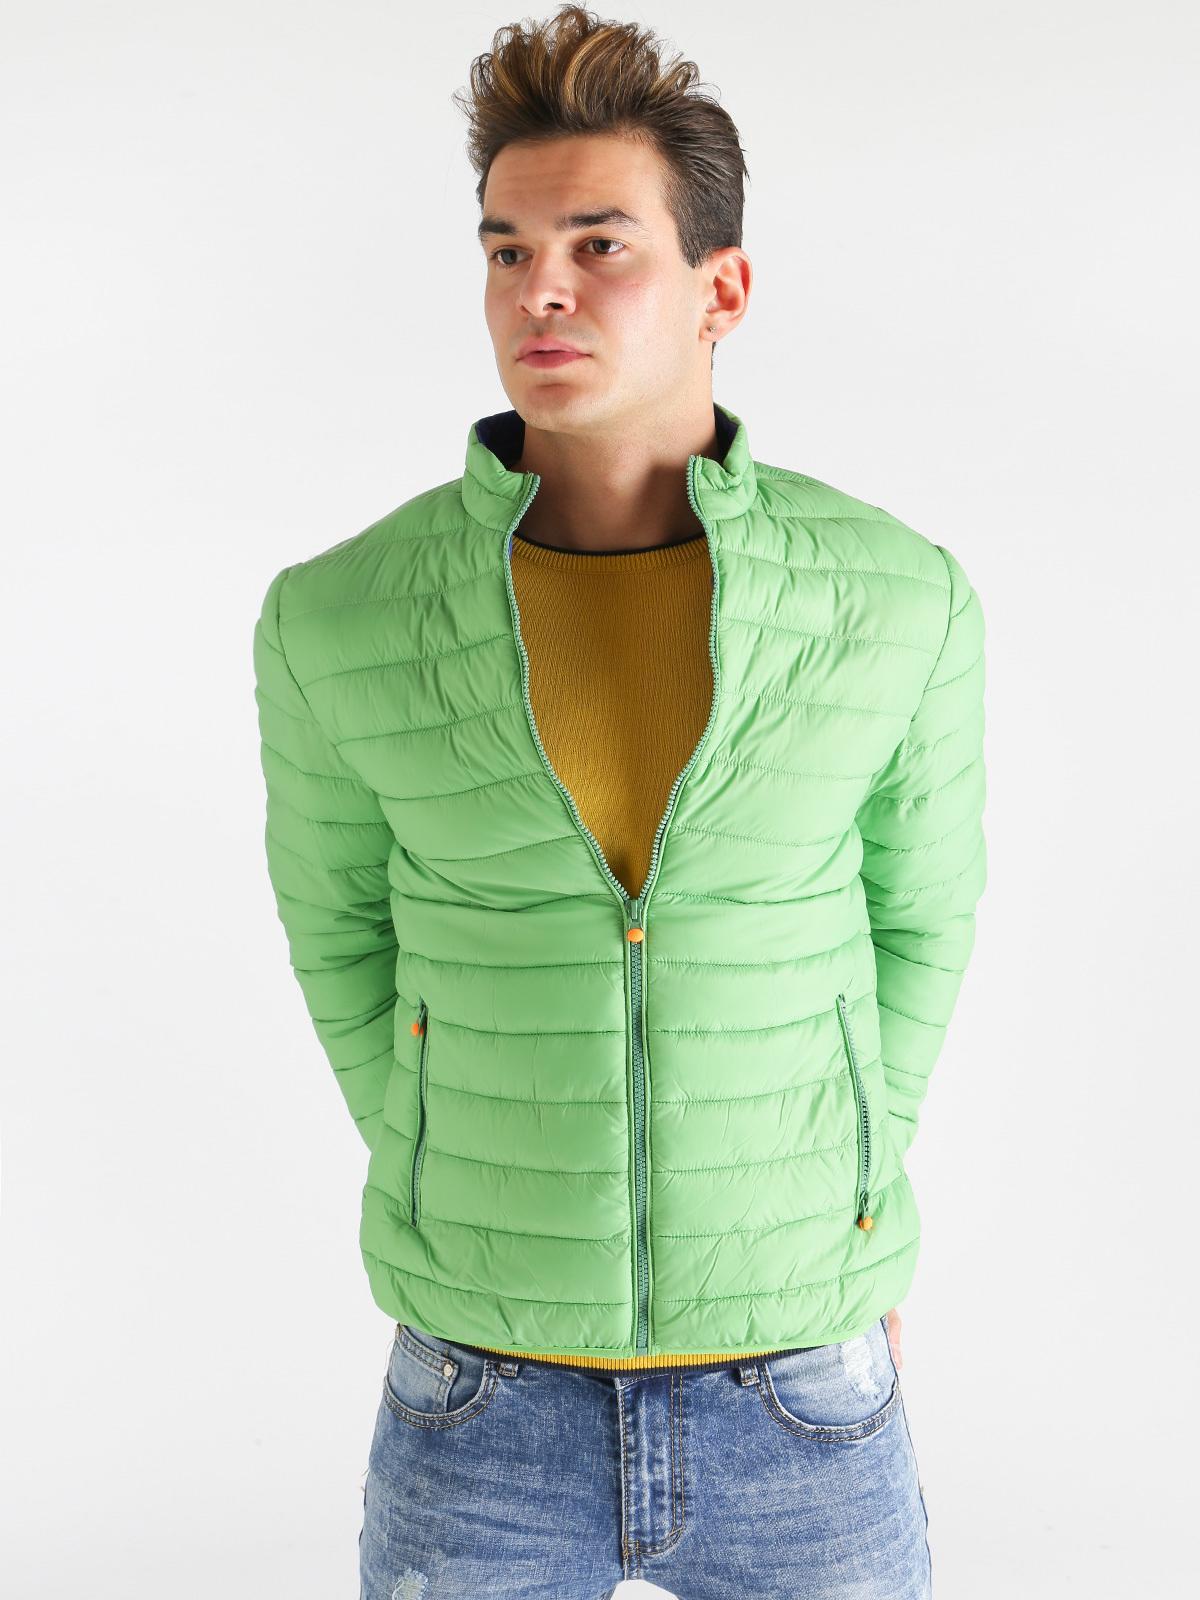 designer fashion c4e0b 3da40 Giubbino imbottito 100g cranberry | MecShopping